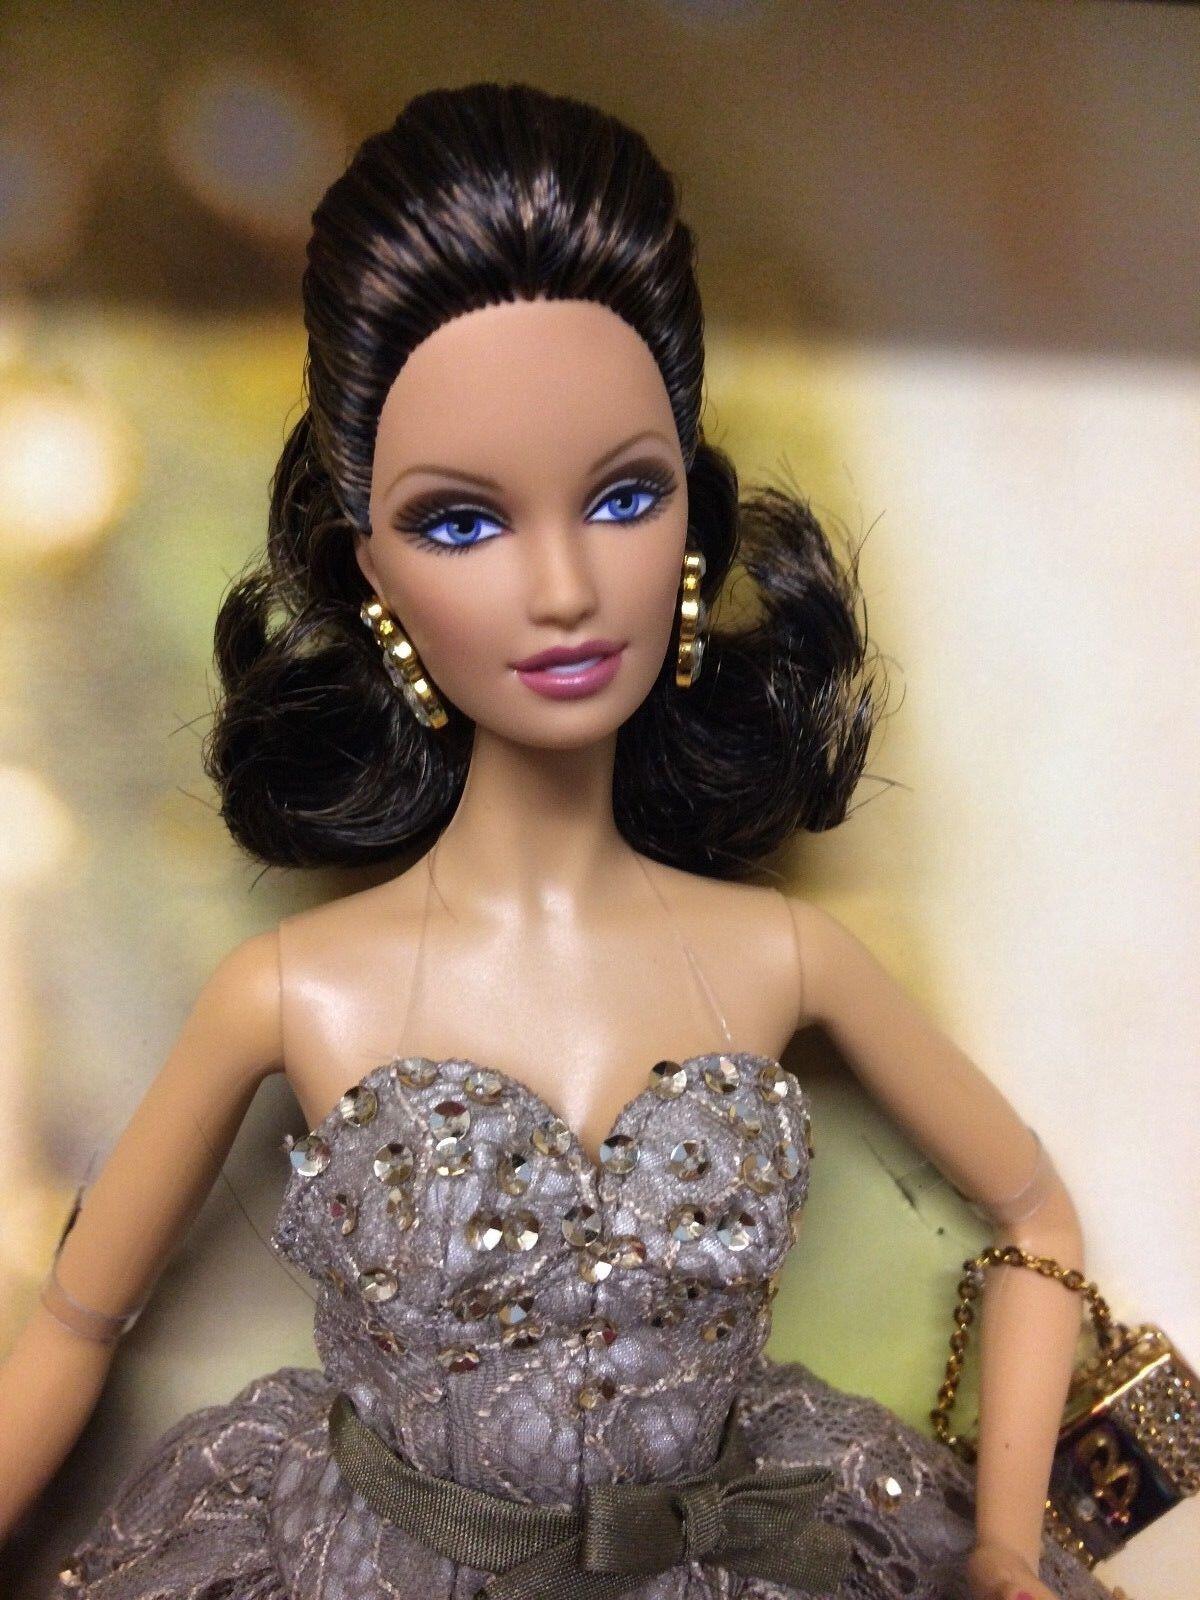 Platinum label, Judith Leiber Barbie doll NRFB Beautiful